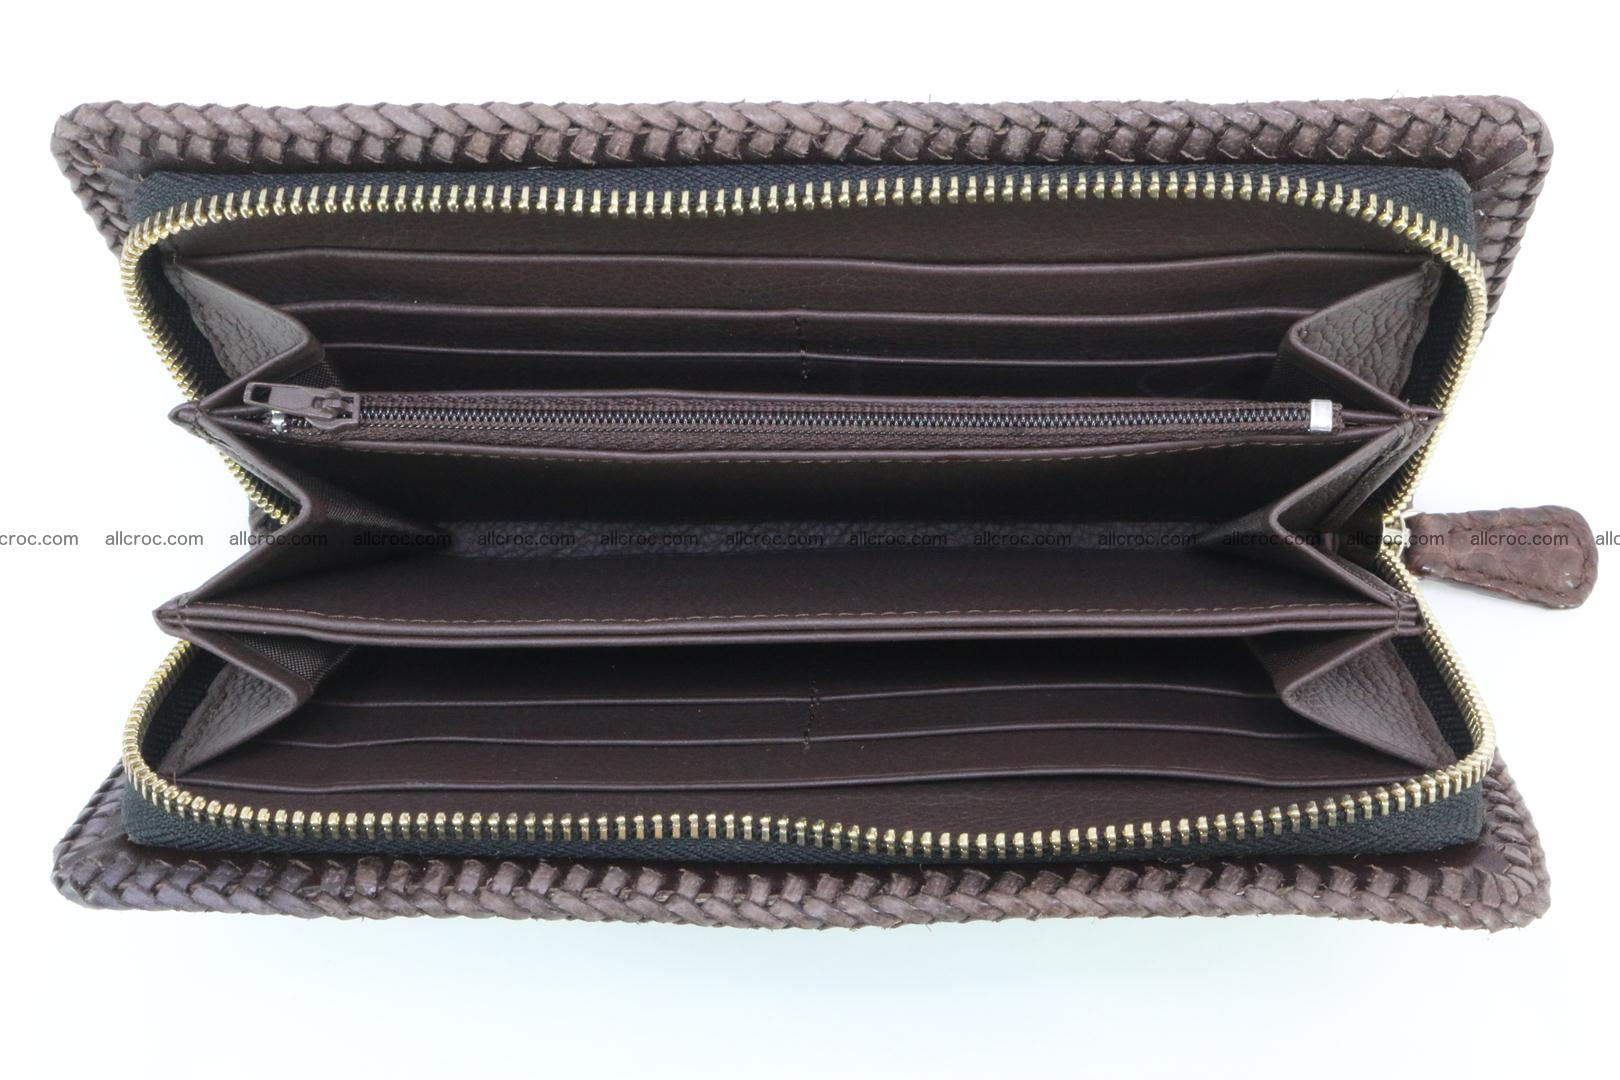 Genuine crocodile hornback wallet with zip 108 Foto 5